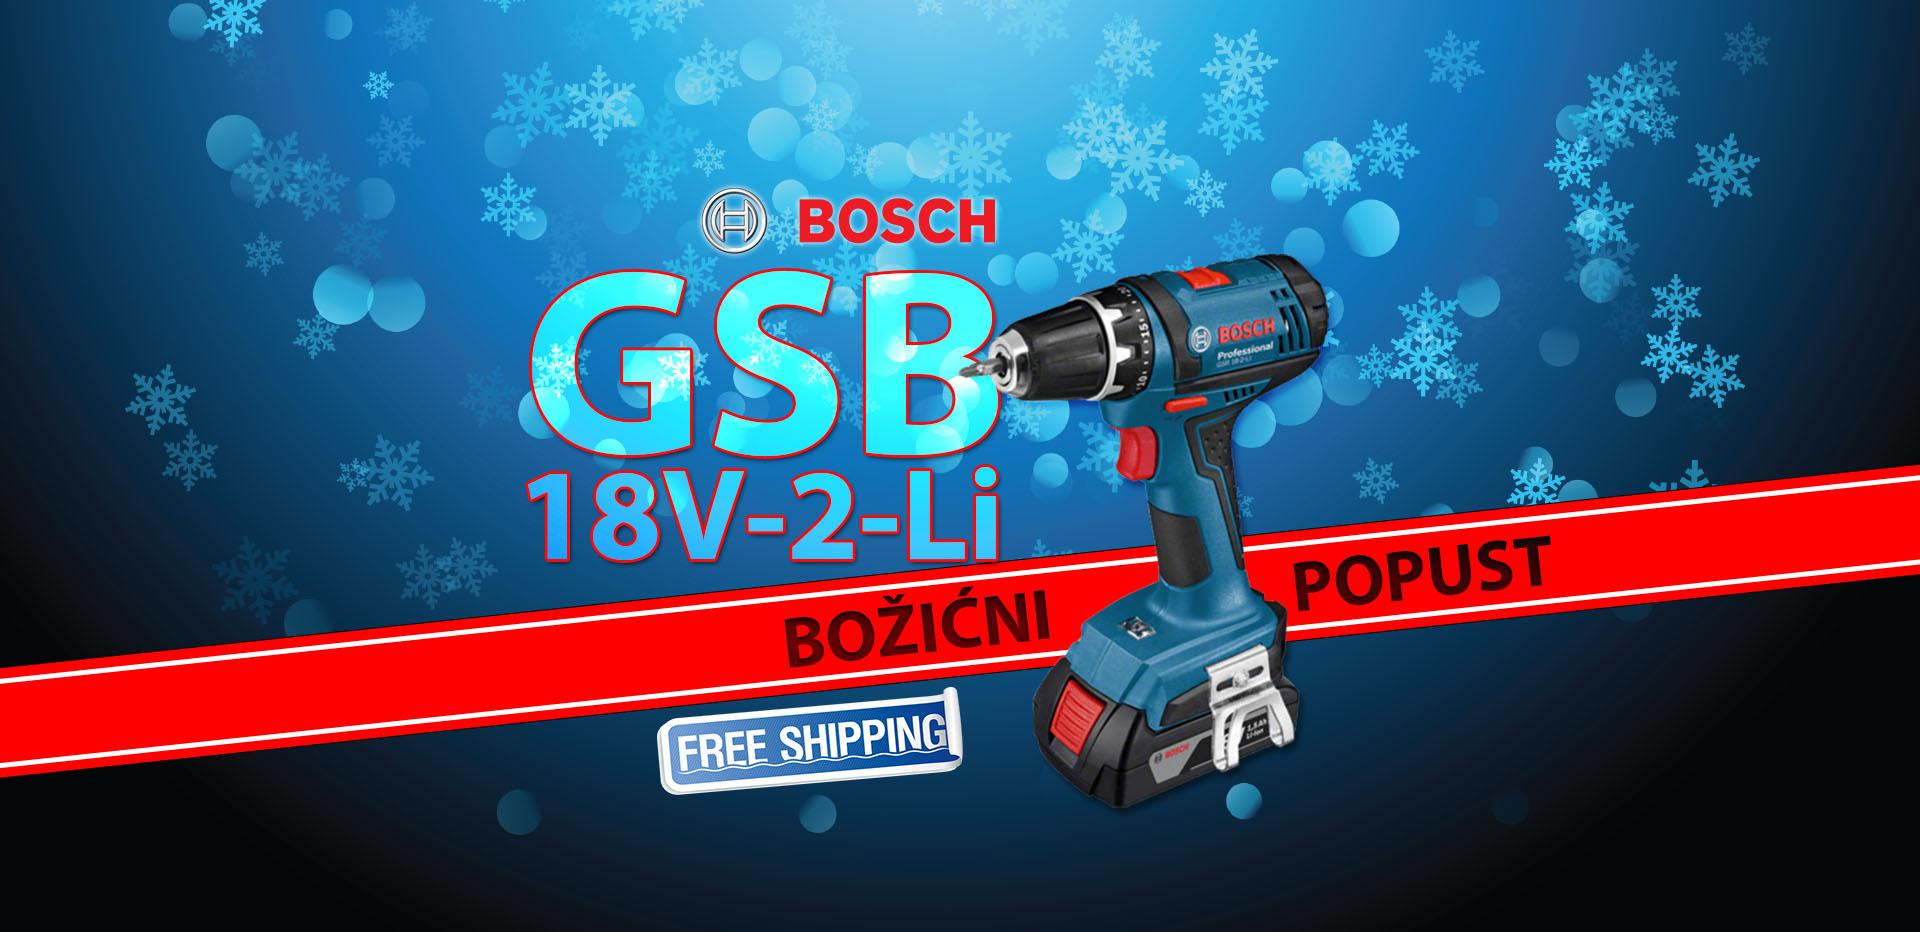 Bosch GSB 18V-2-Li